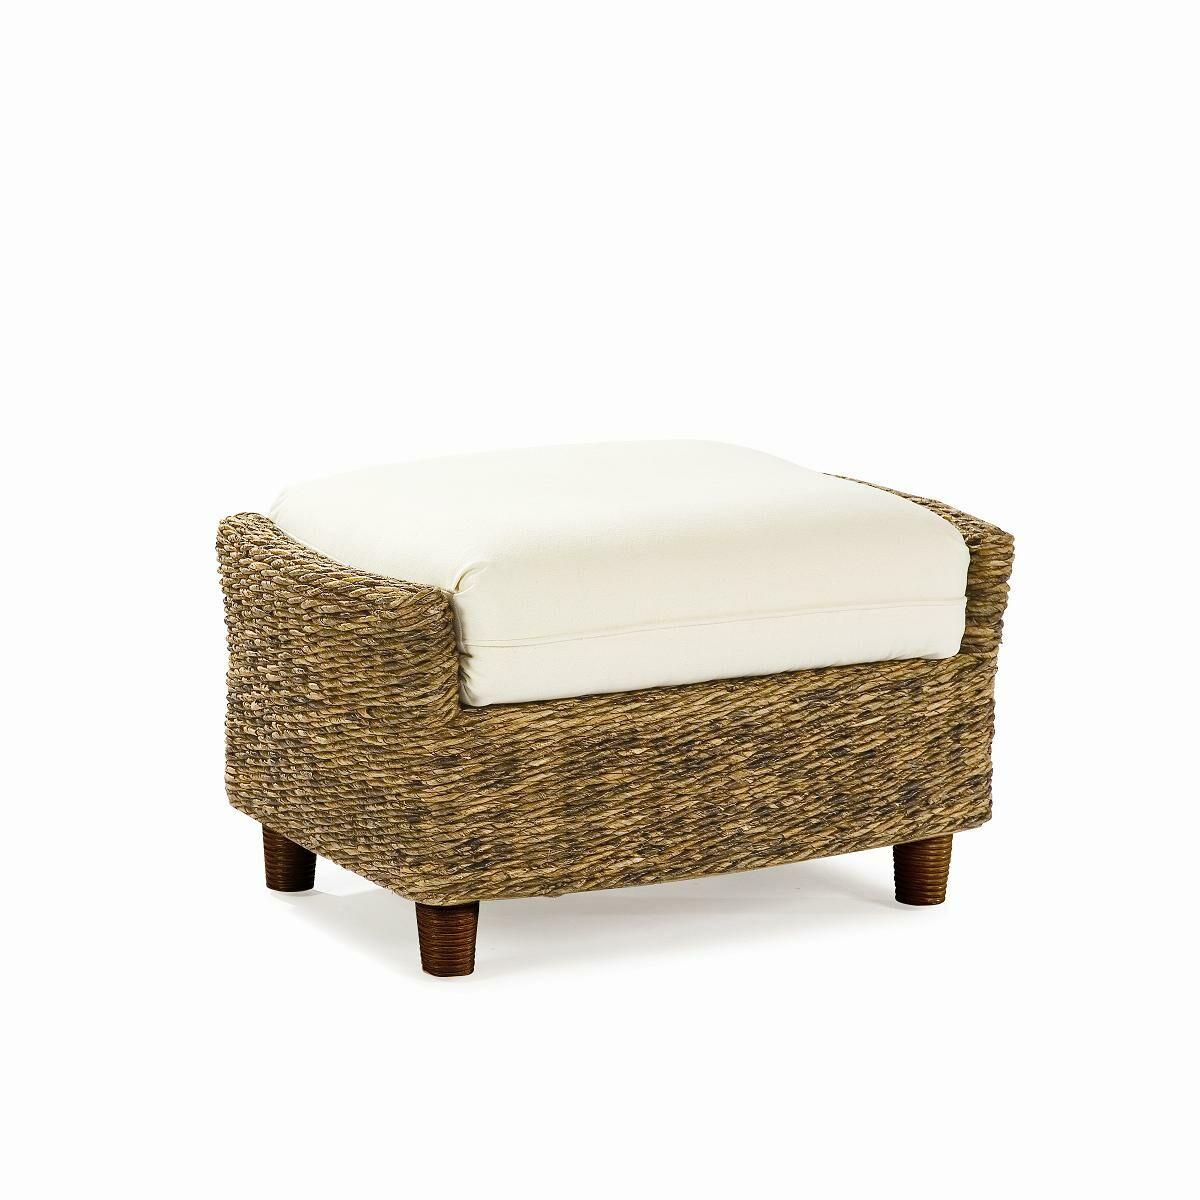 Tangiers Ottoman with Cushion Fabric: Spectrum Kiwi